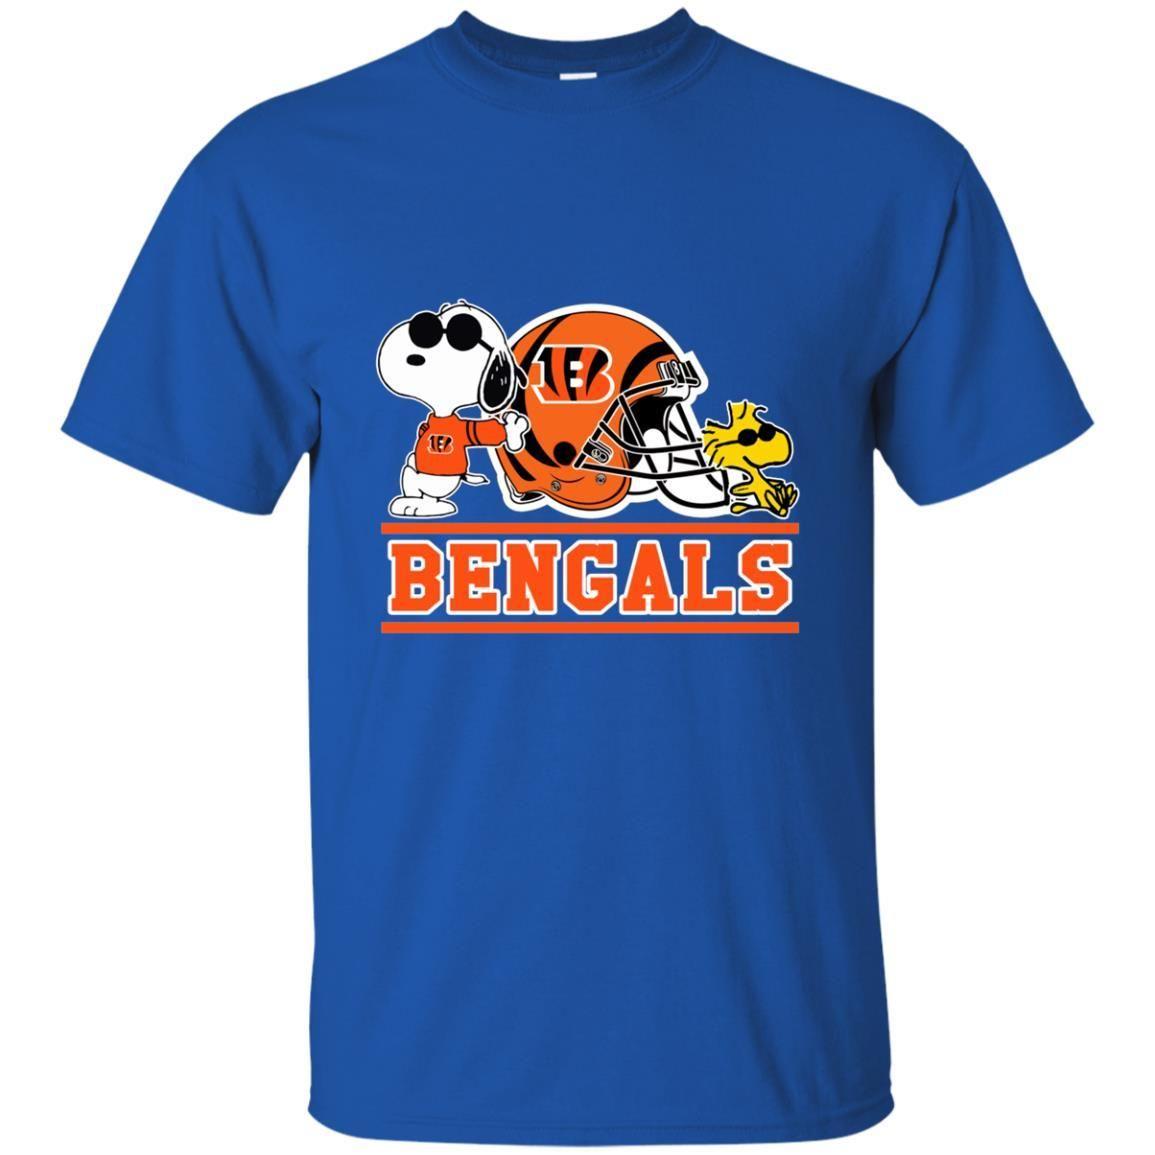 Cincinnati Bengals Snoopy S S Shirts